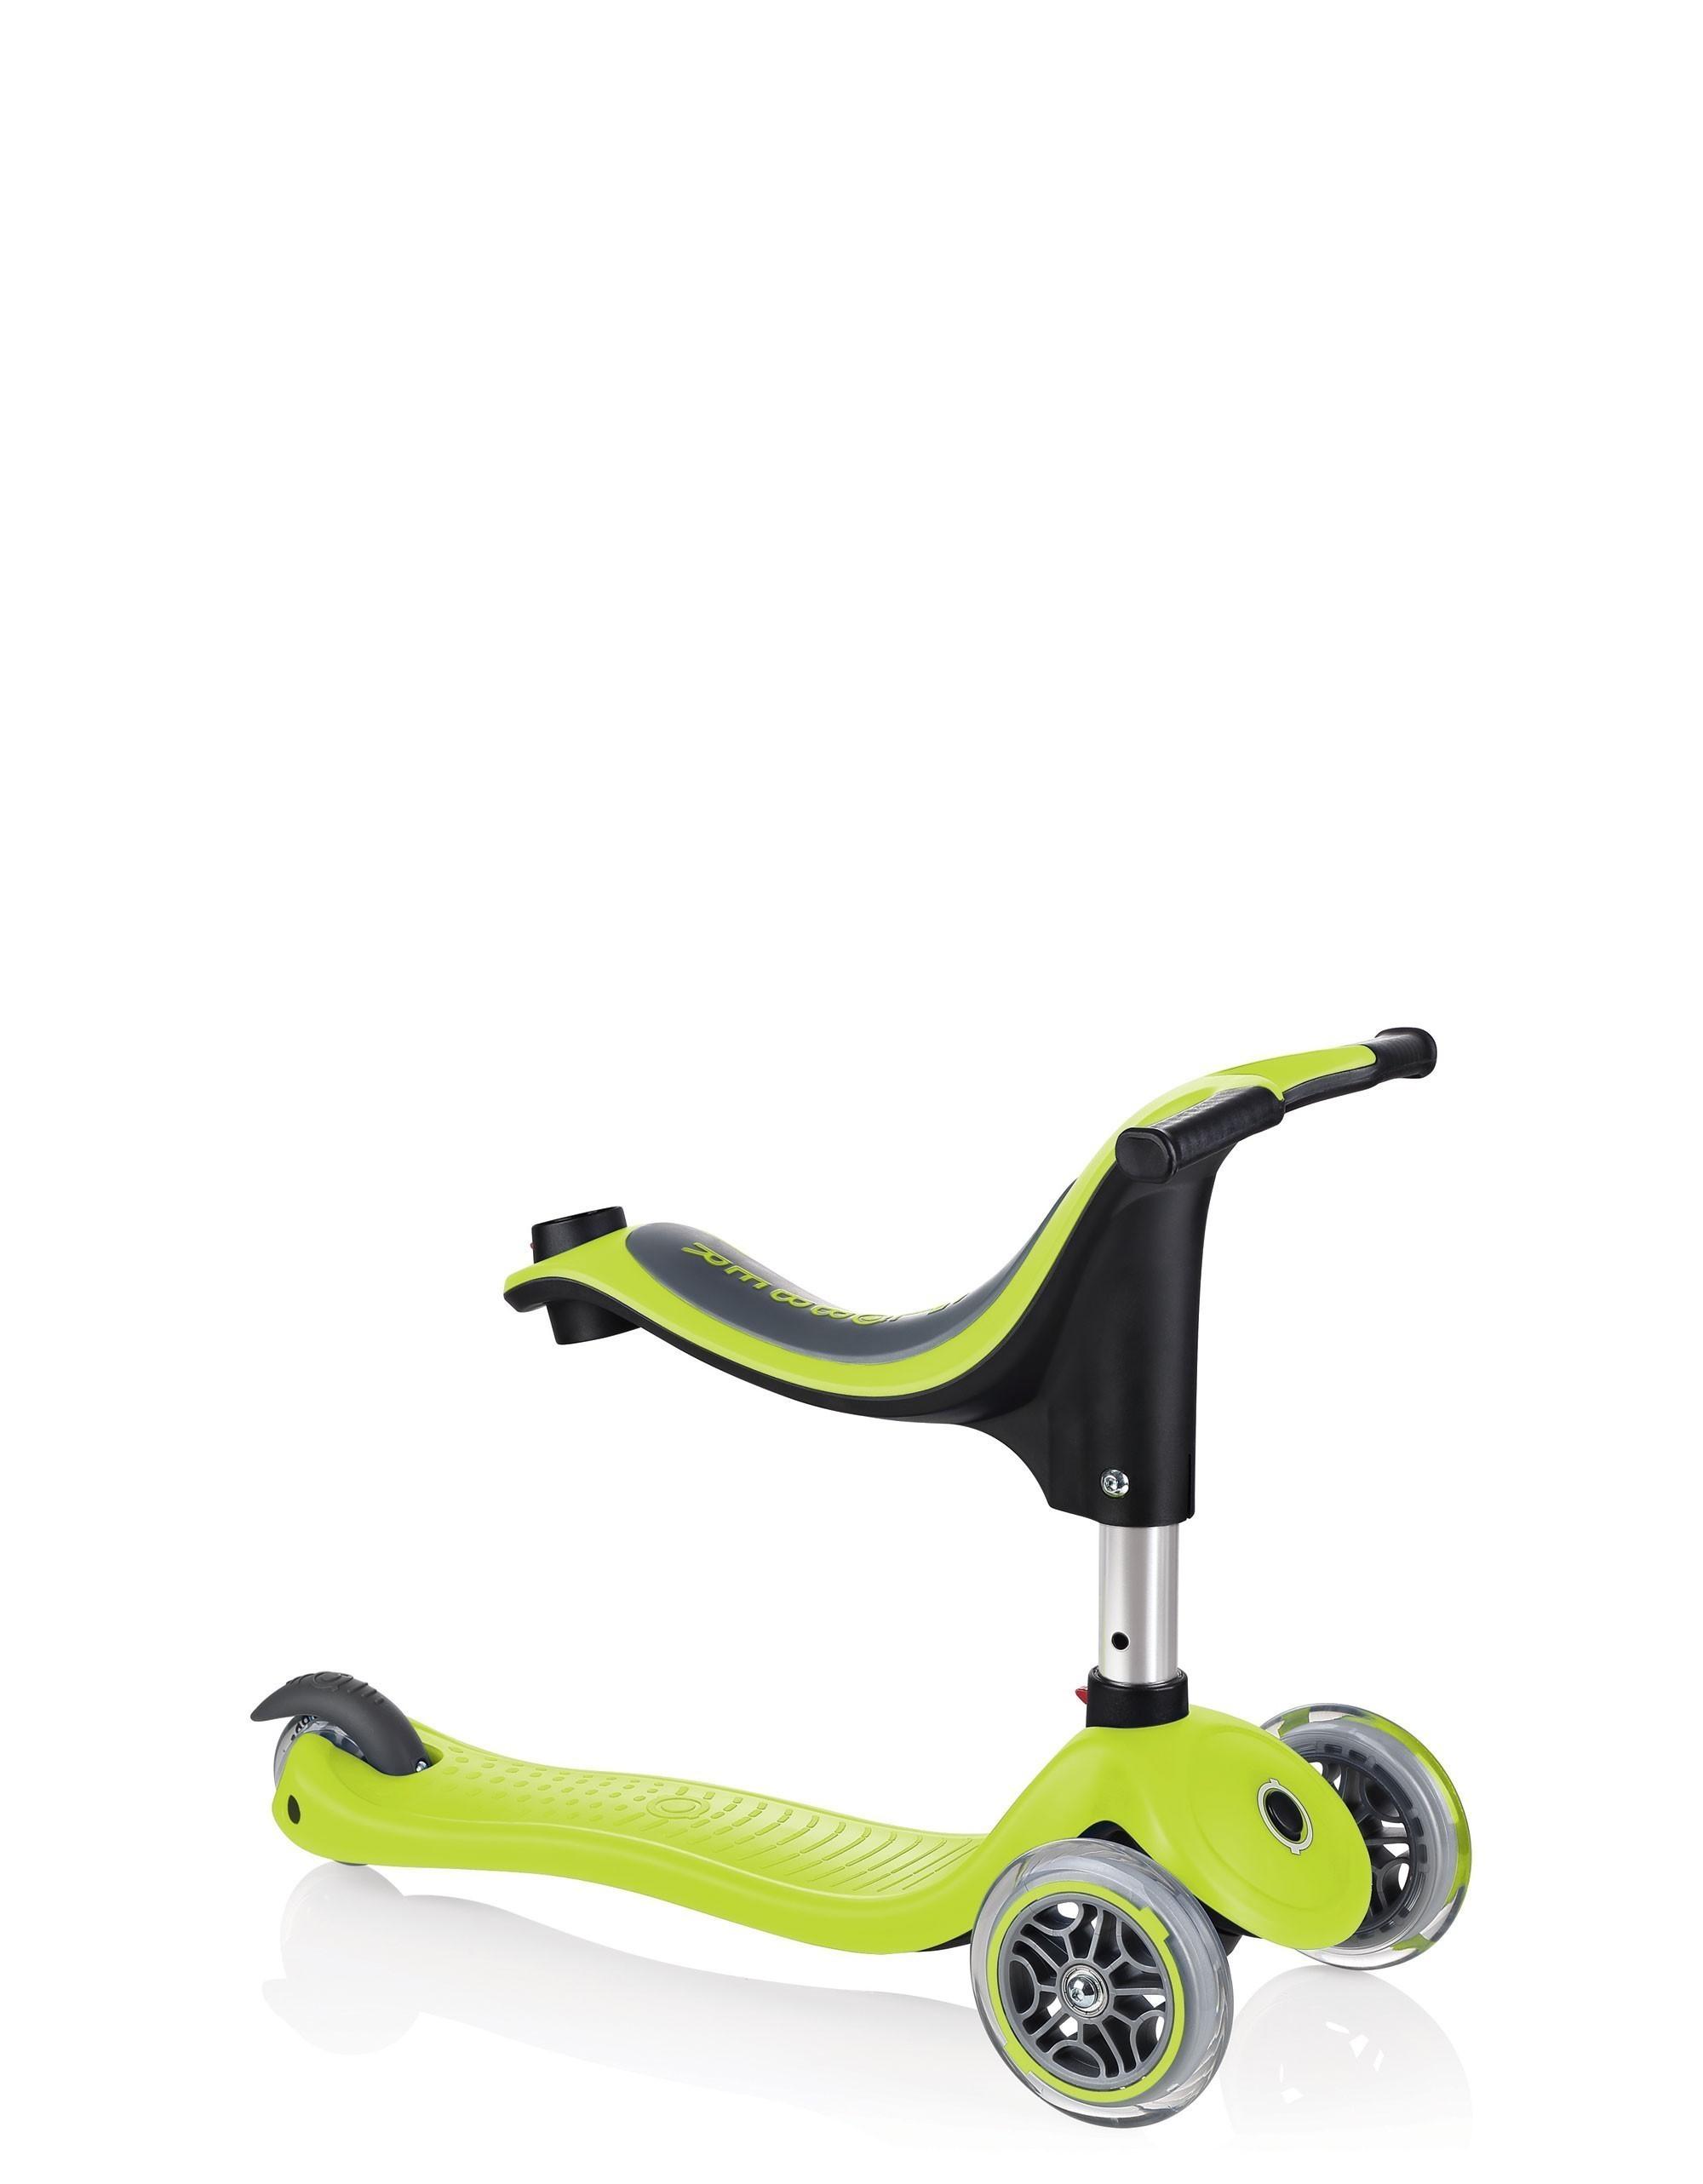 Scooter / Kinderroller / Dreirad / Laufrad Globber Evo 4in1 grün Bild 3